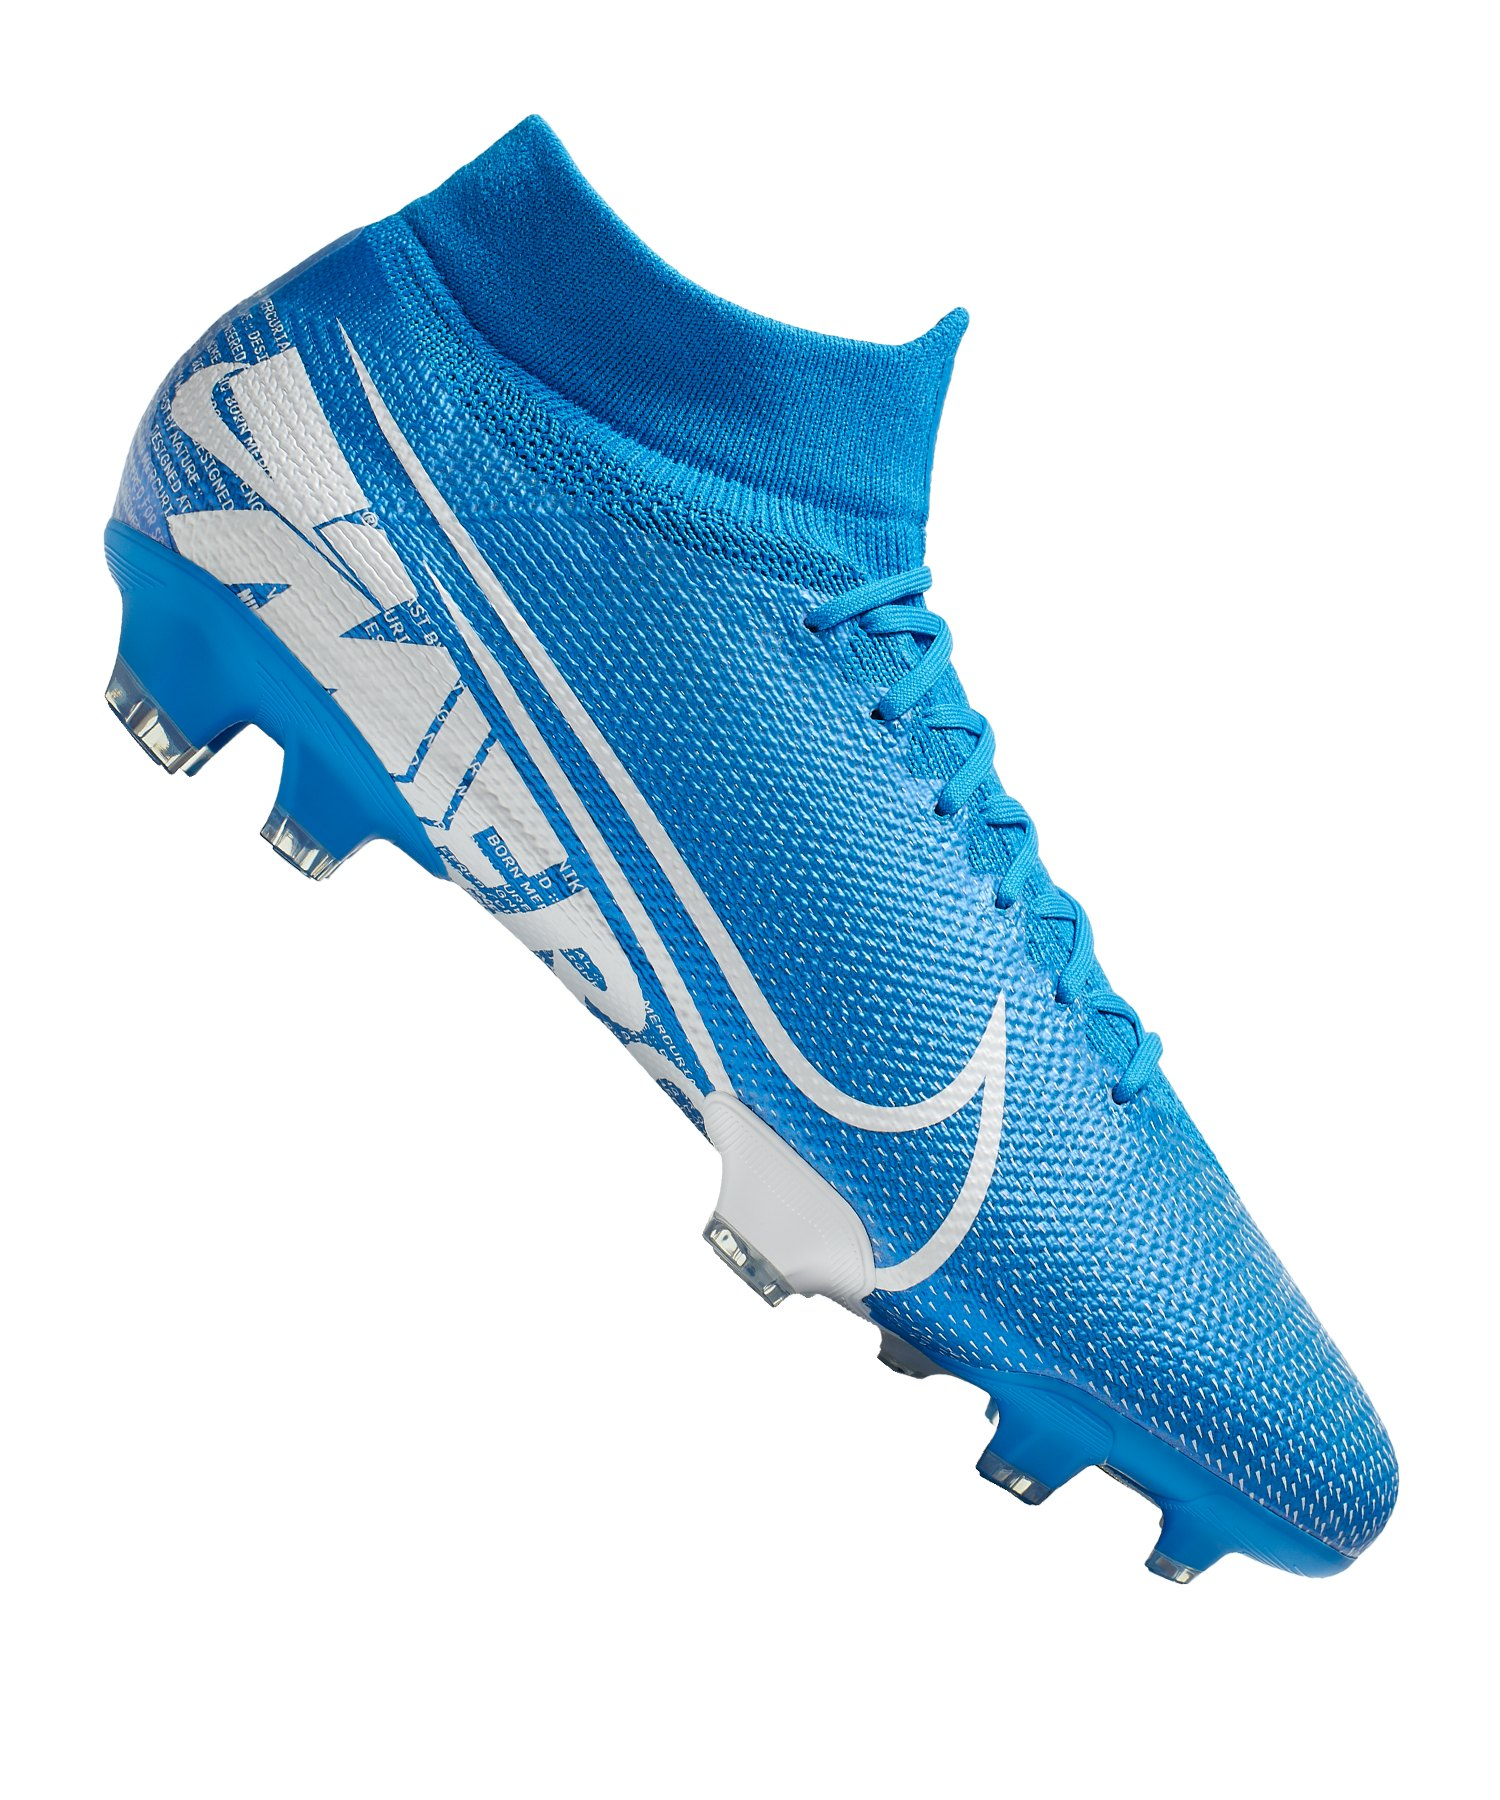 Nike Mercurial Superfly VII Pro FG Blau Weiss F414 - blau